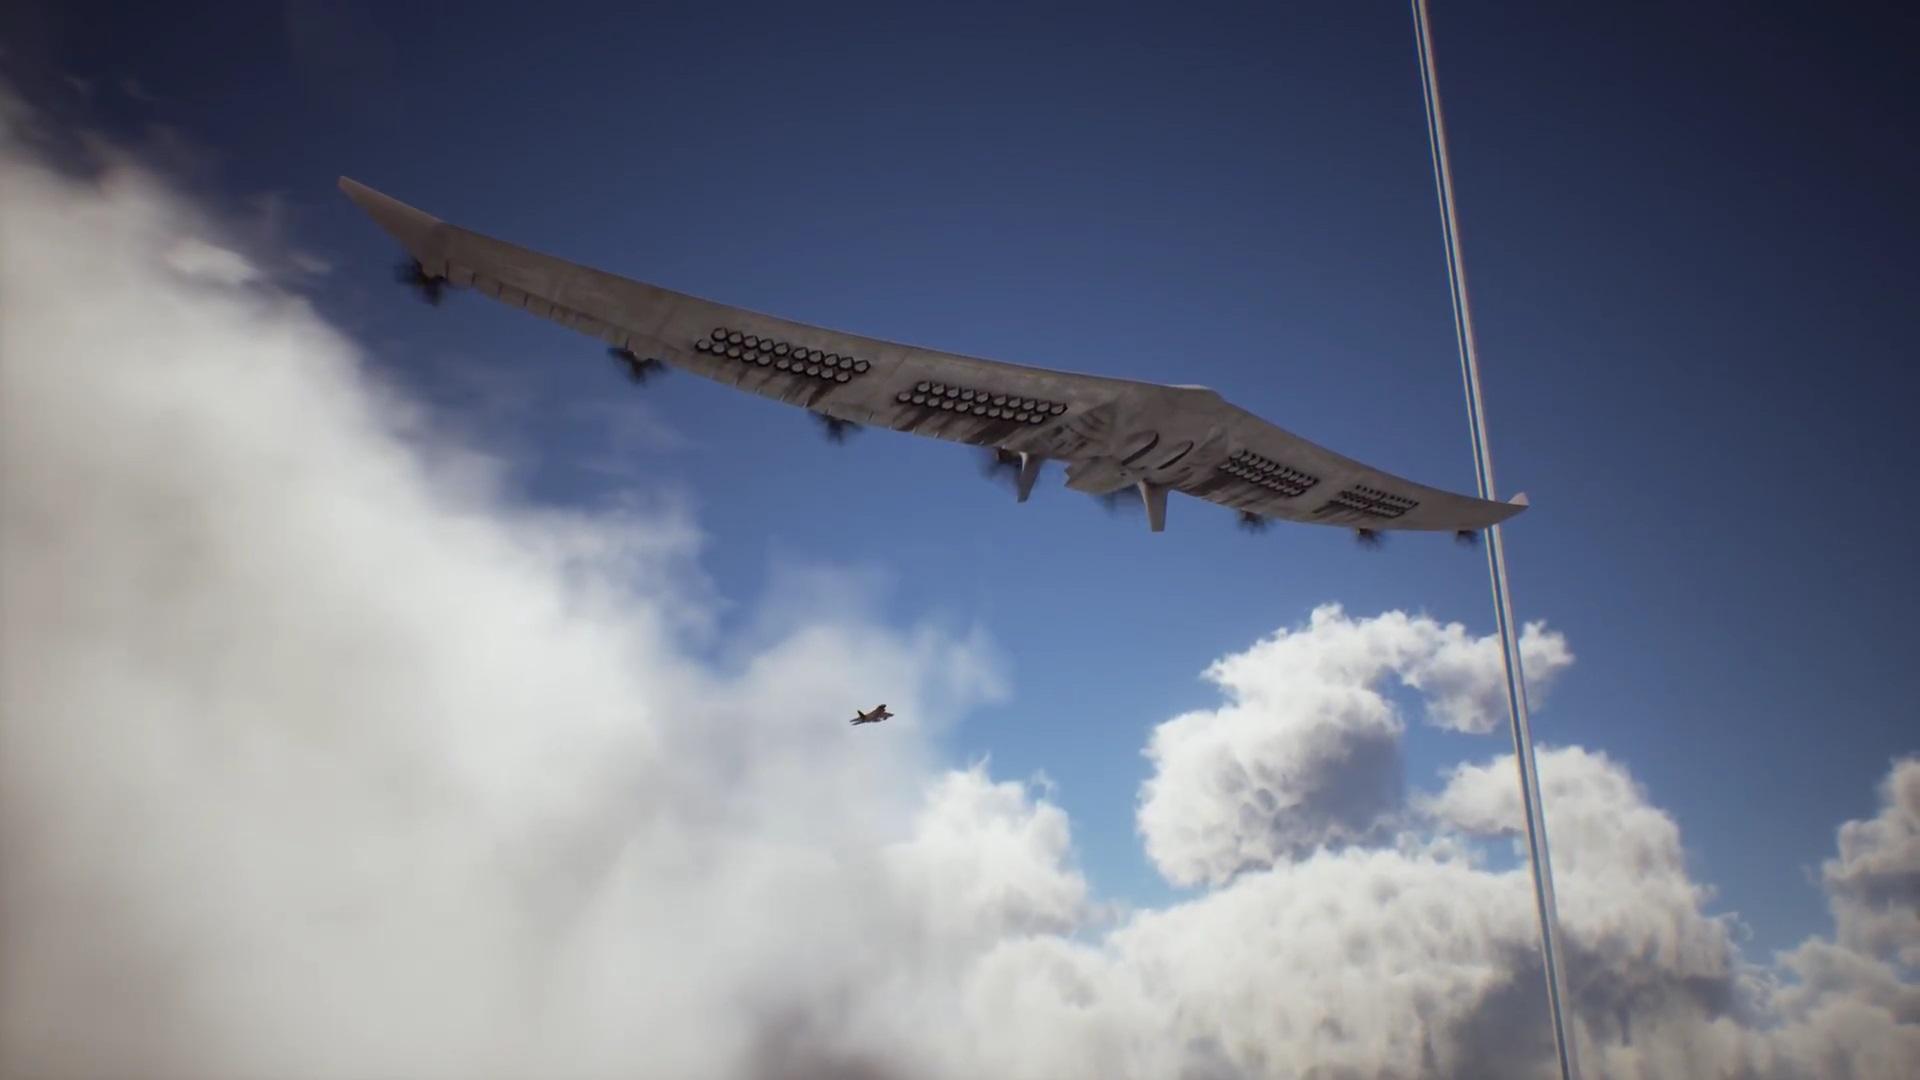 Ace combat x skies of deception 7